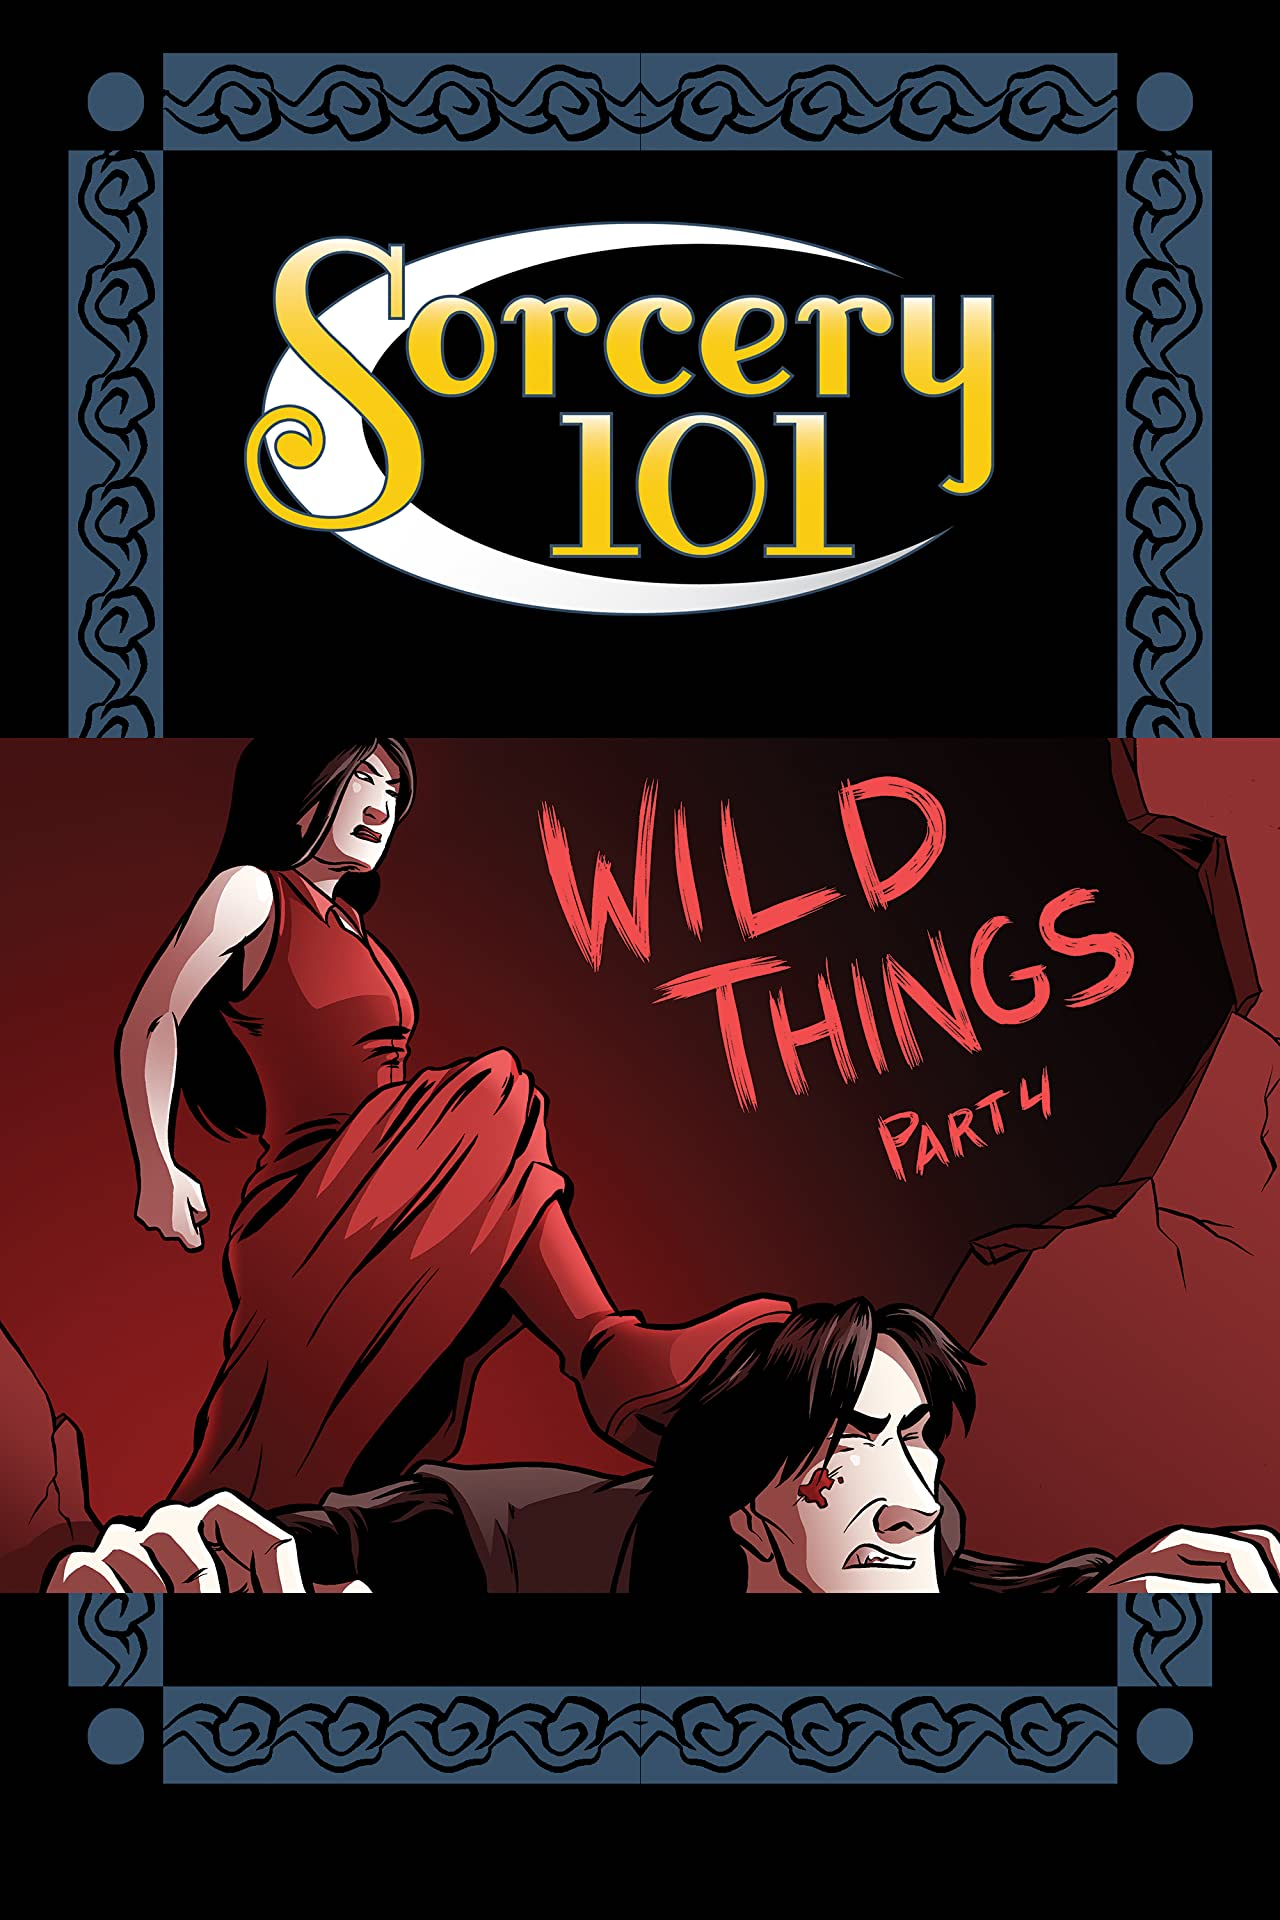 Sorcery 101 #7